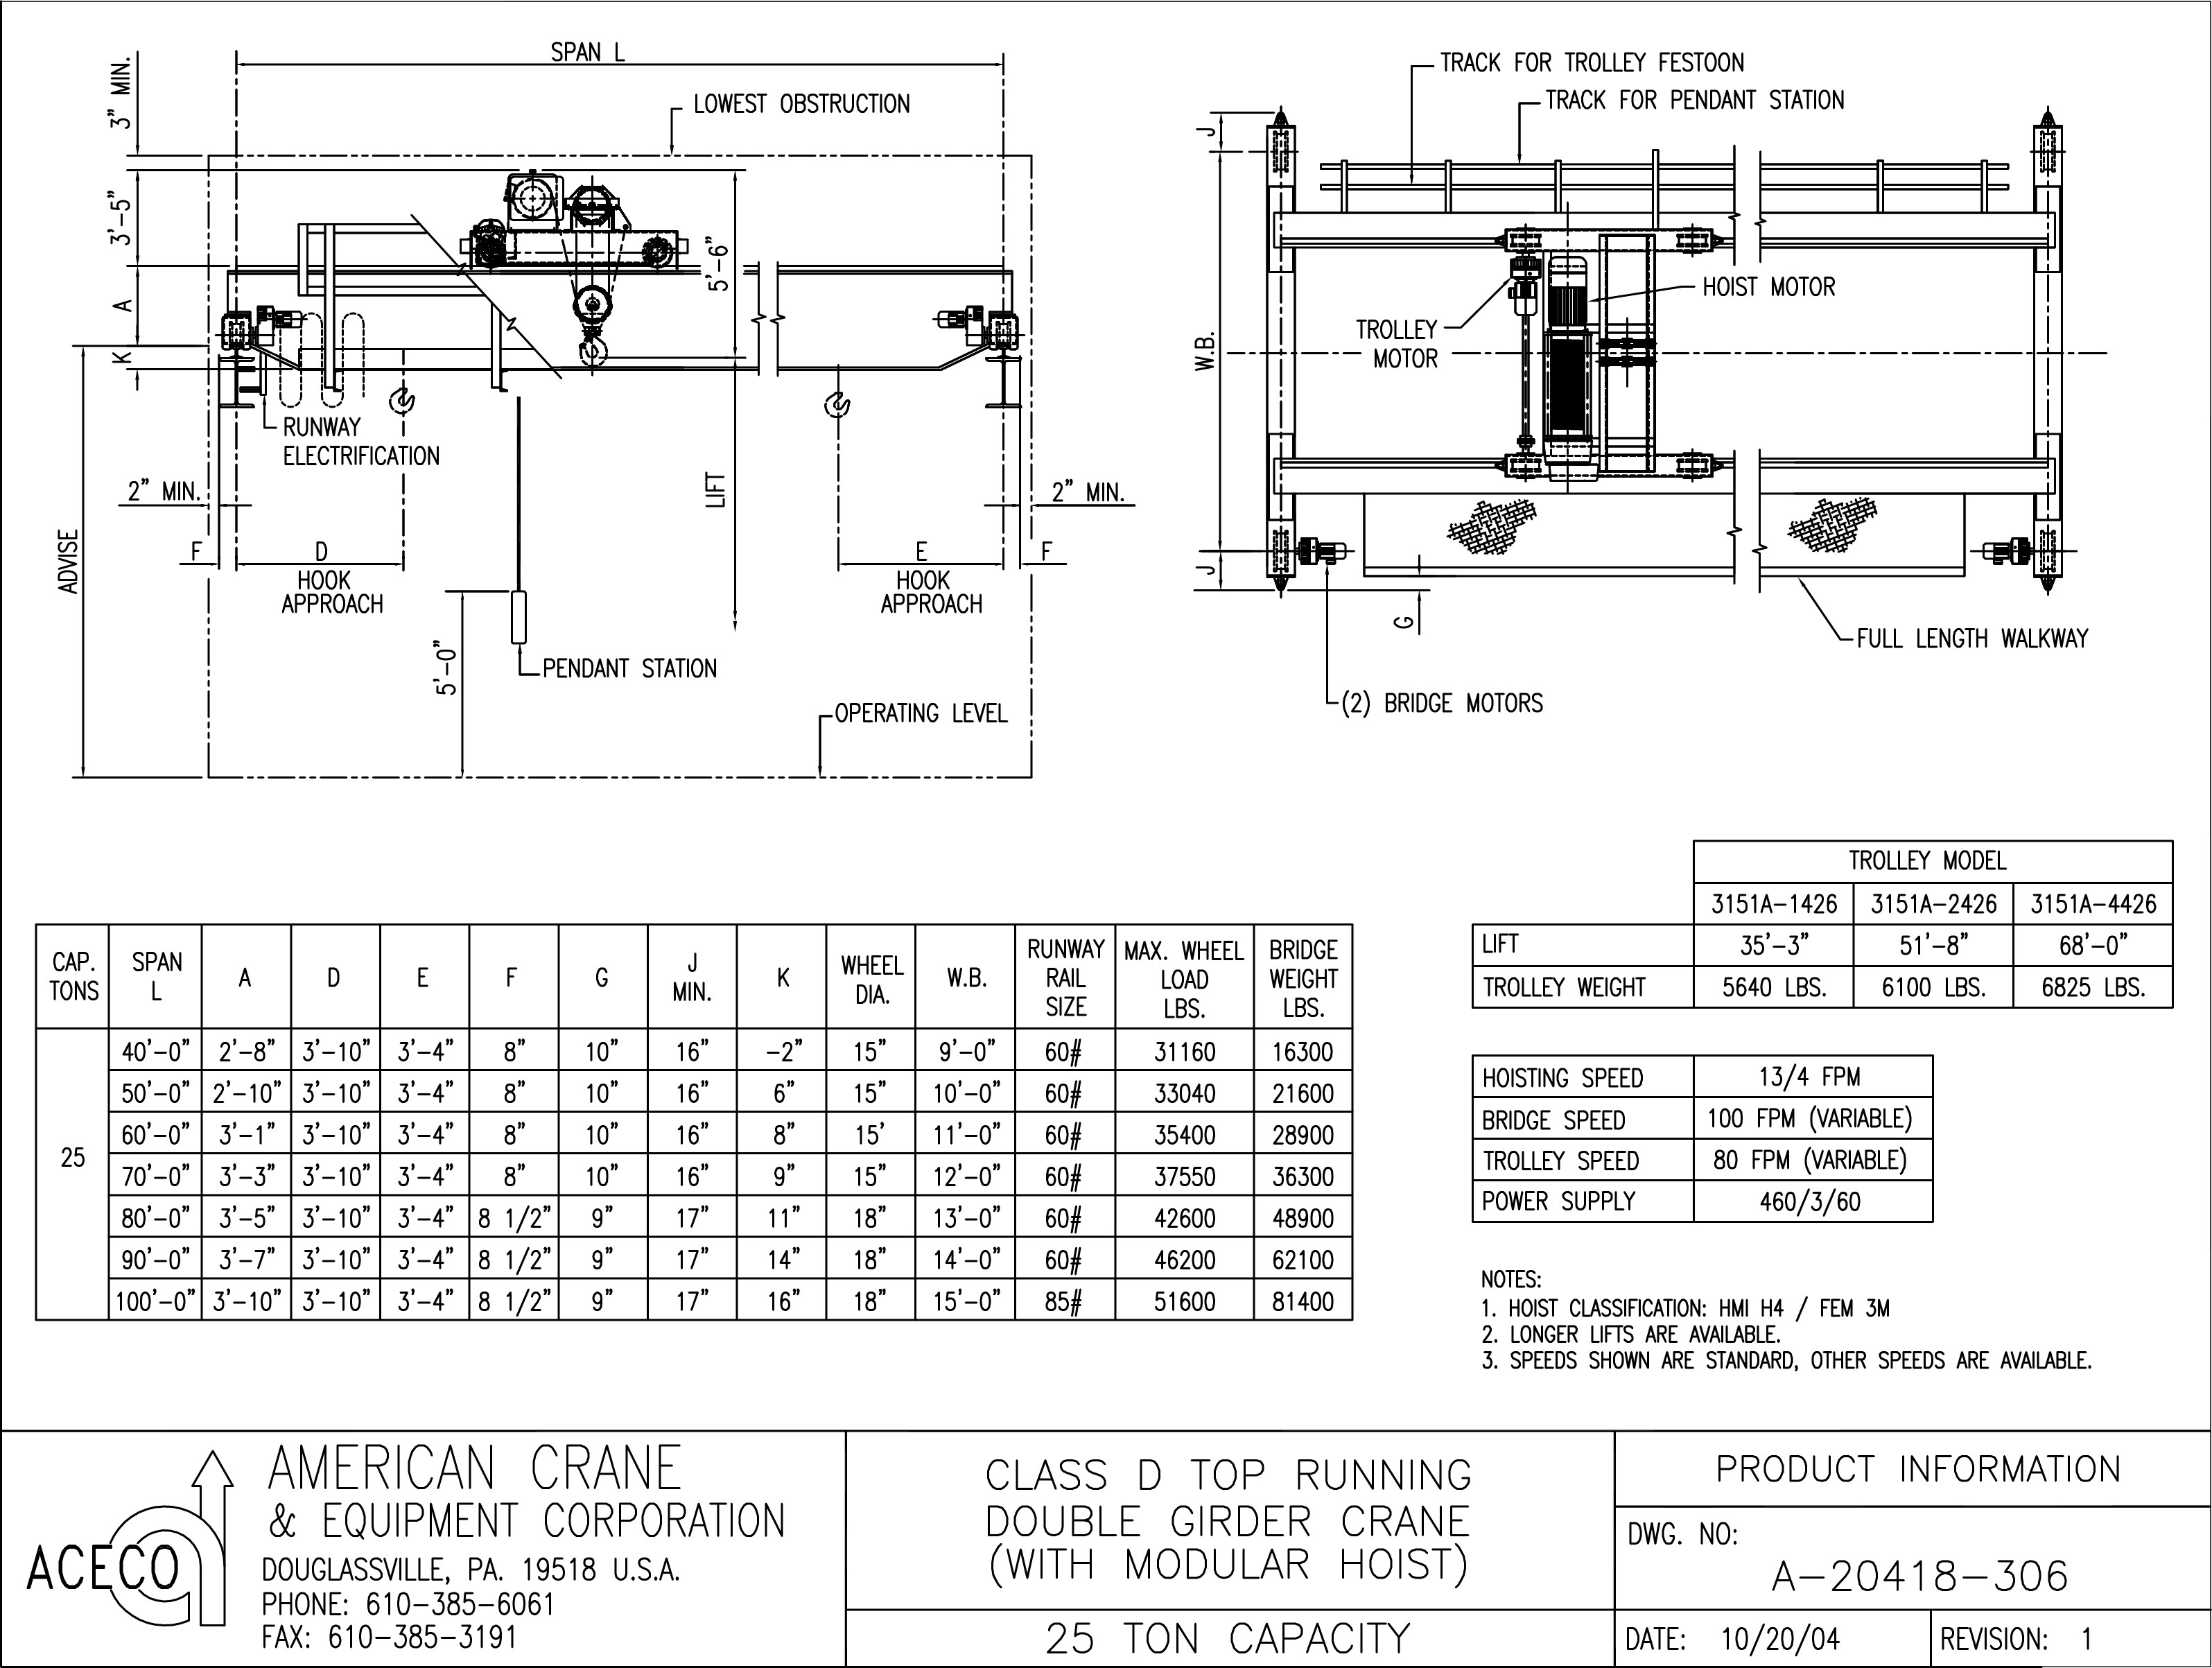 Product Code 25680trw4 Top Running Double Girder Crane And Overhead Wiring Diagram Trolleymotorandoverheadcranewiring Icon Aceco Wire Rope Hoist Standard Cad Image 20418306r1